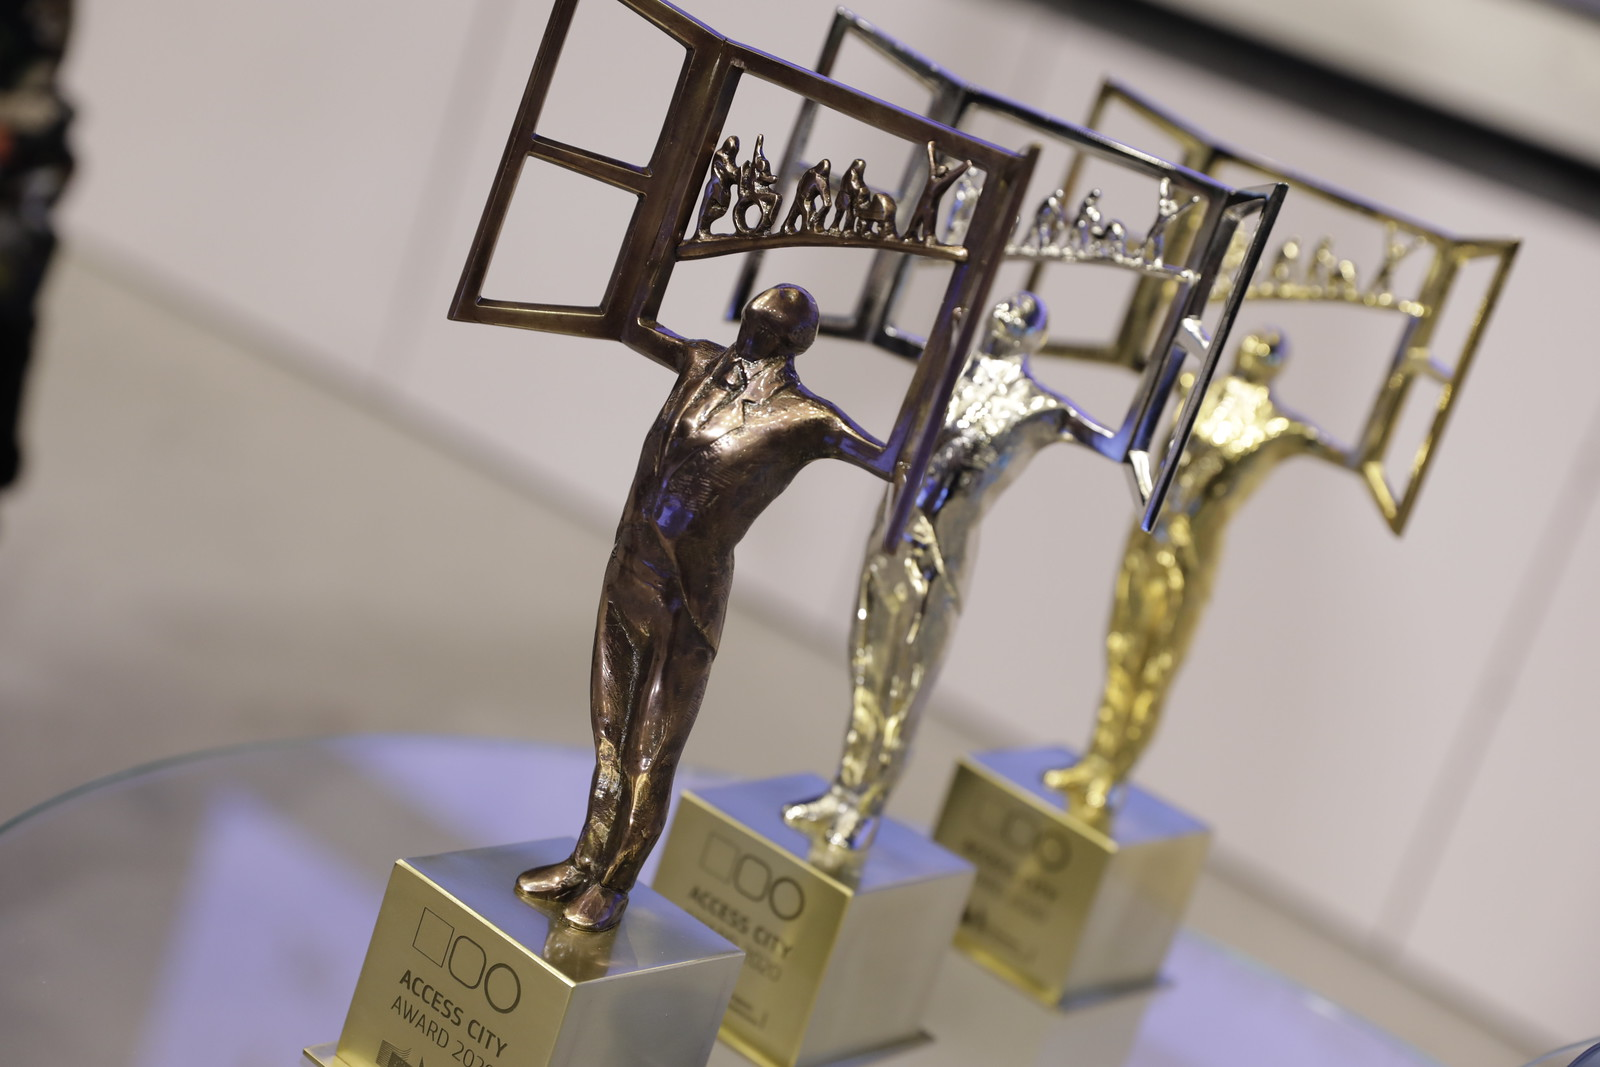 Access City Award 2020